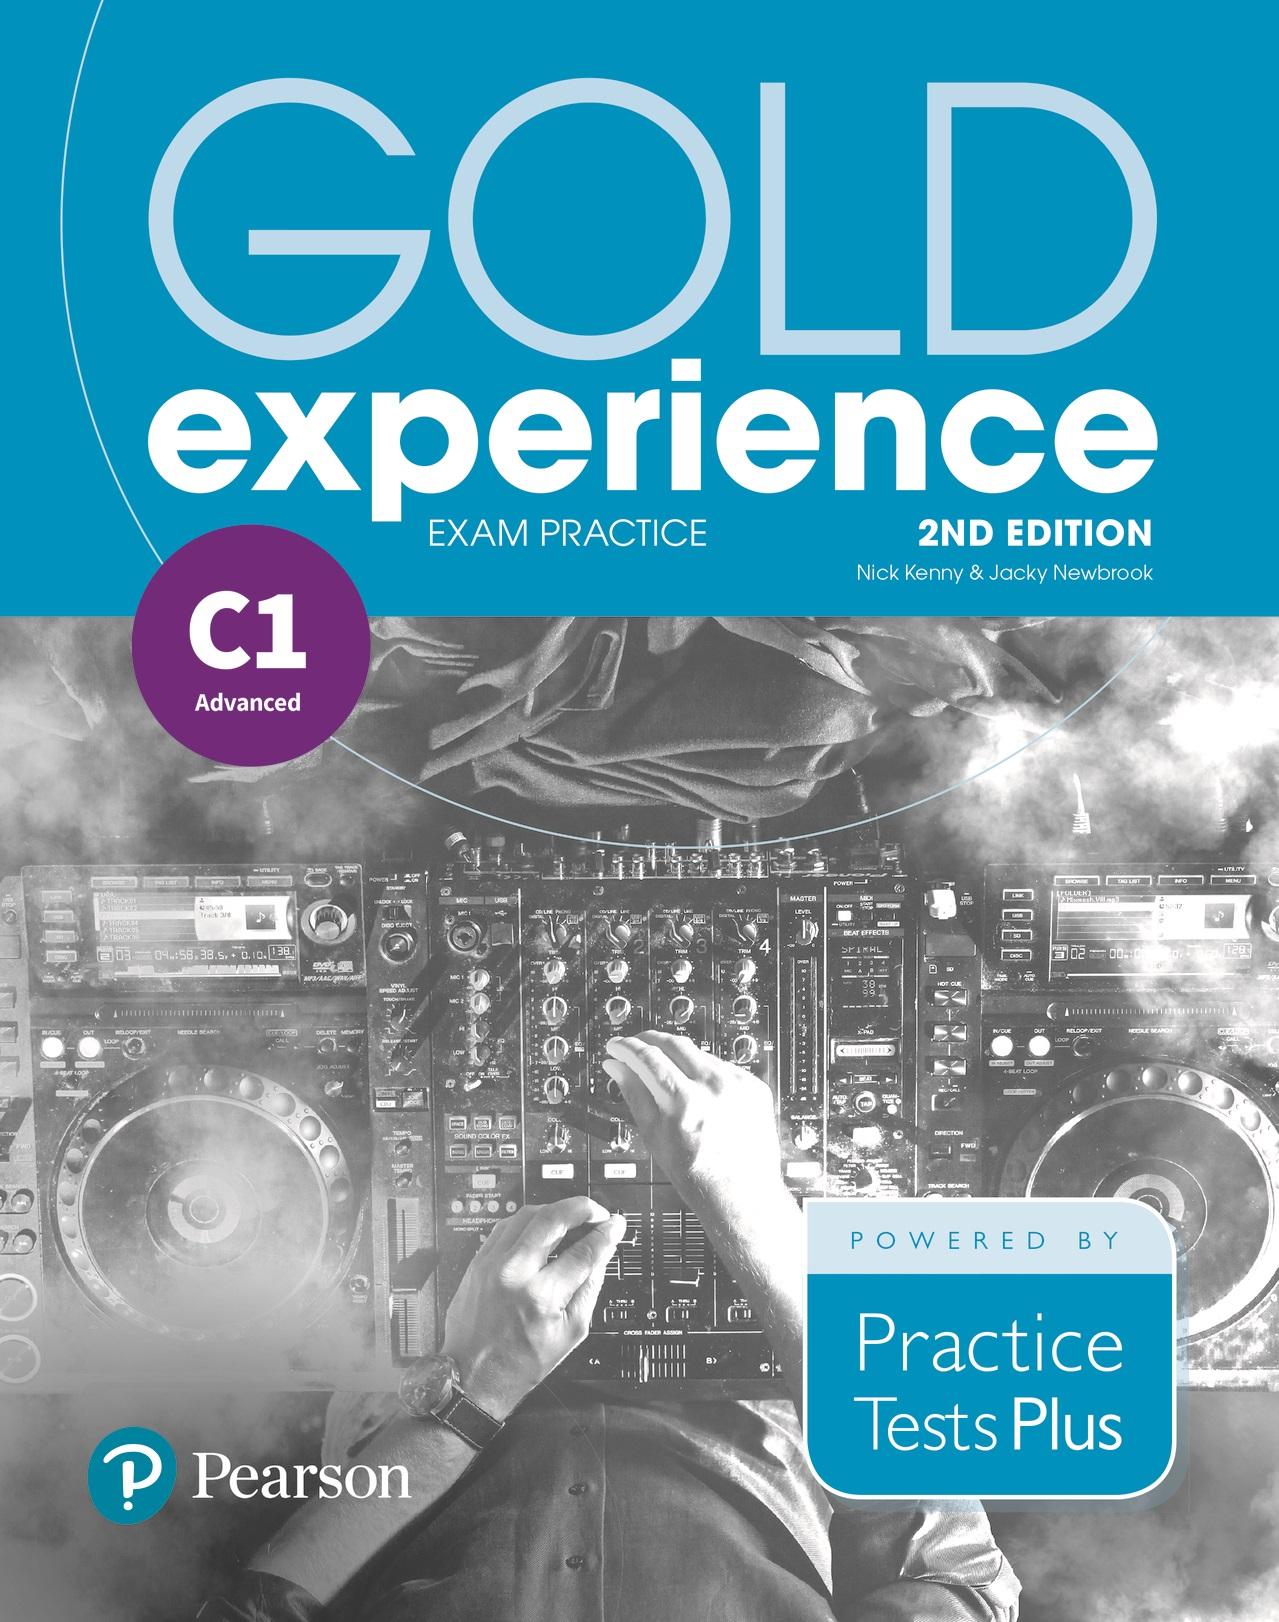 Gold Experience 2ed C1 Exam Practice: Cambridge English Advanced